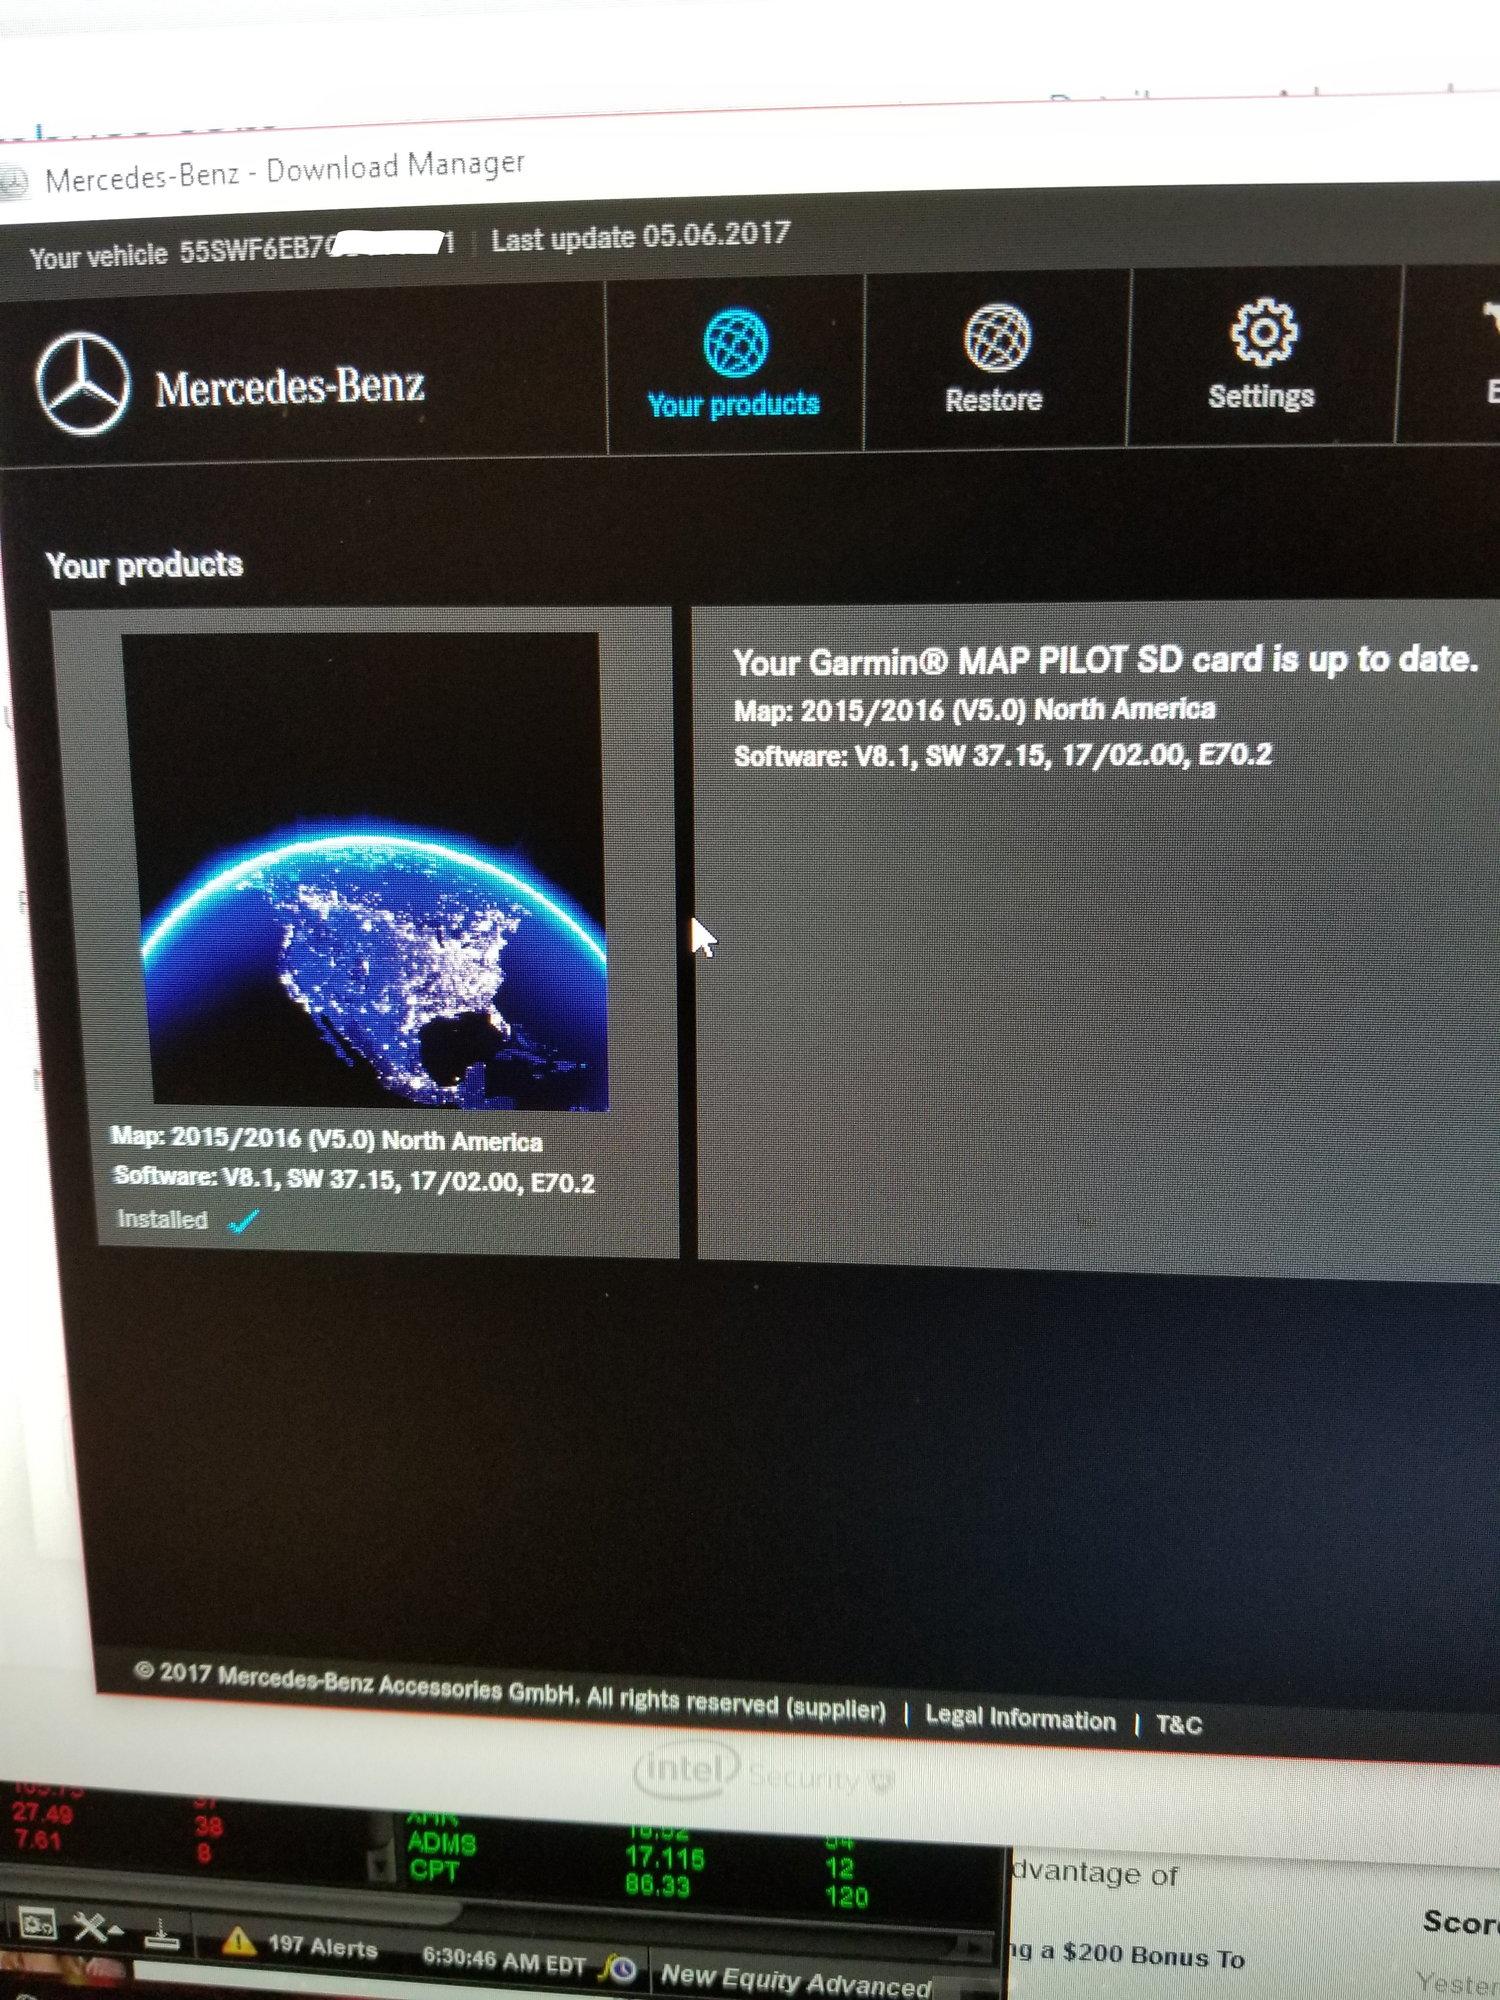 Garmin Map Pilot most recent version? - MBWorld org Forums